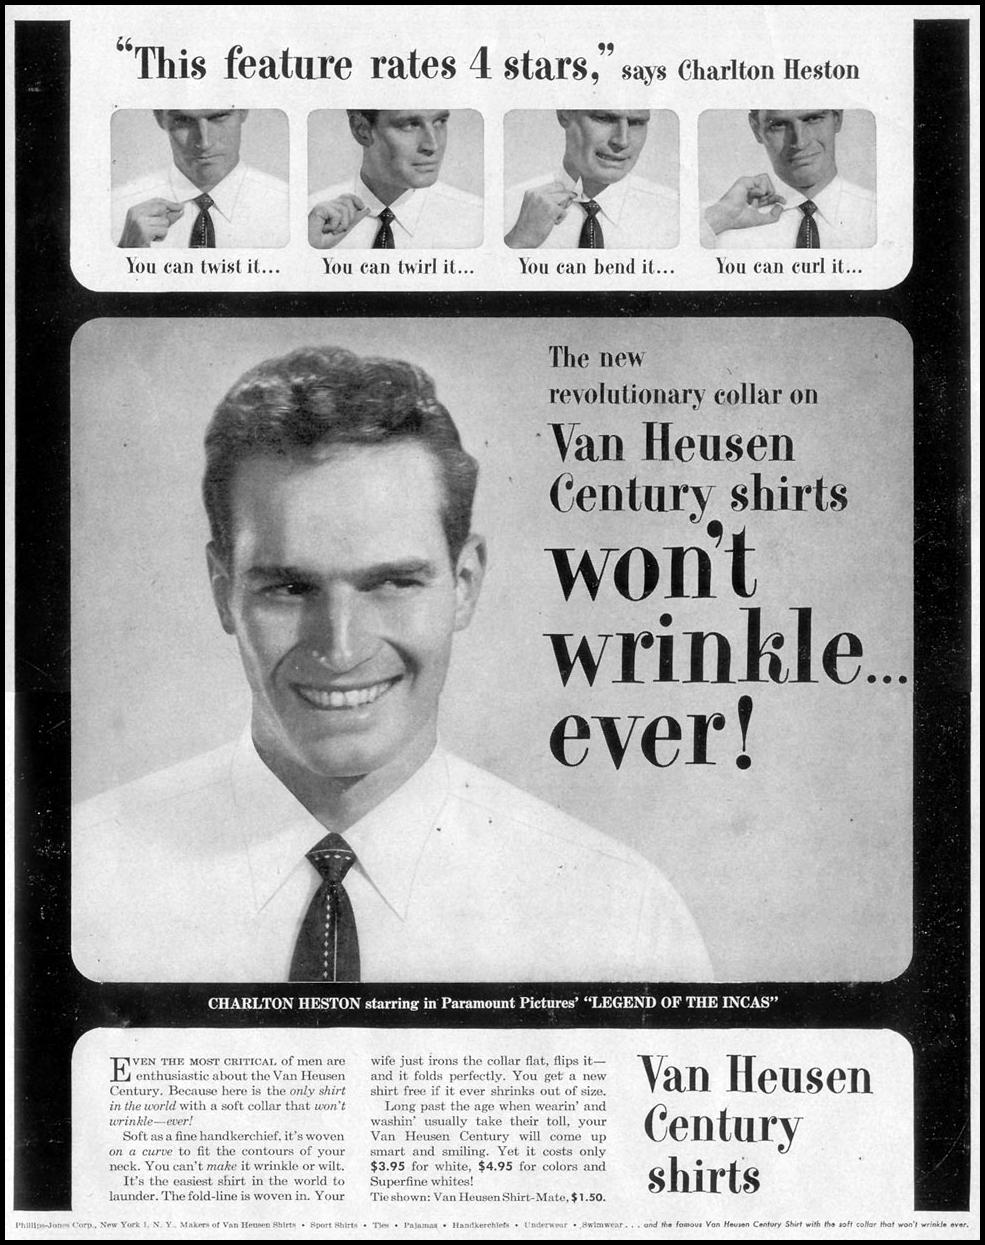 VAN HEUSEN CENTURY SHIRTS LIFE 09/07/1953 p. 175